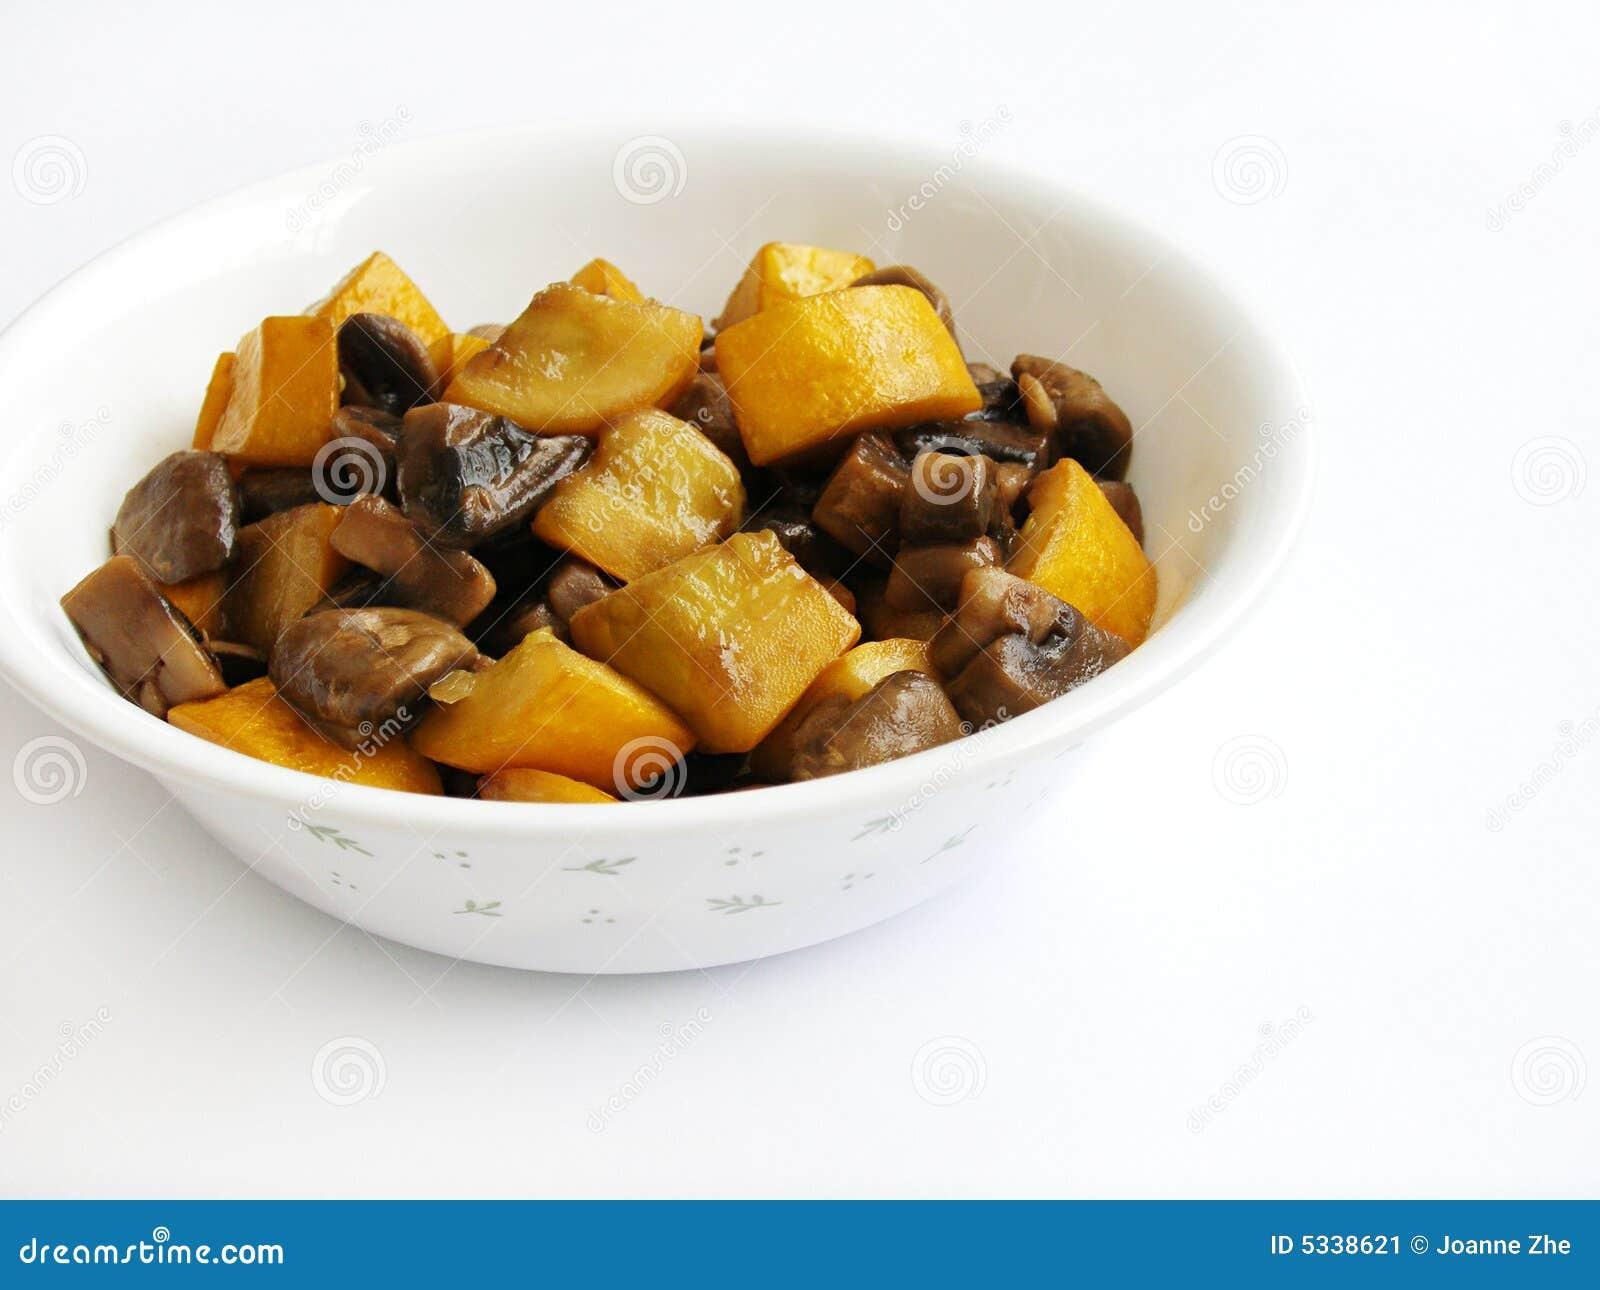 Stir fry organic vegetarian